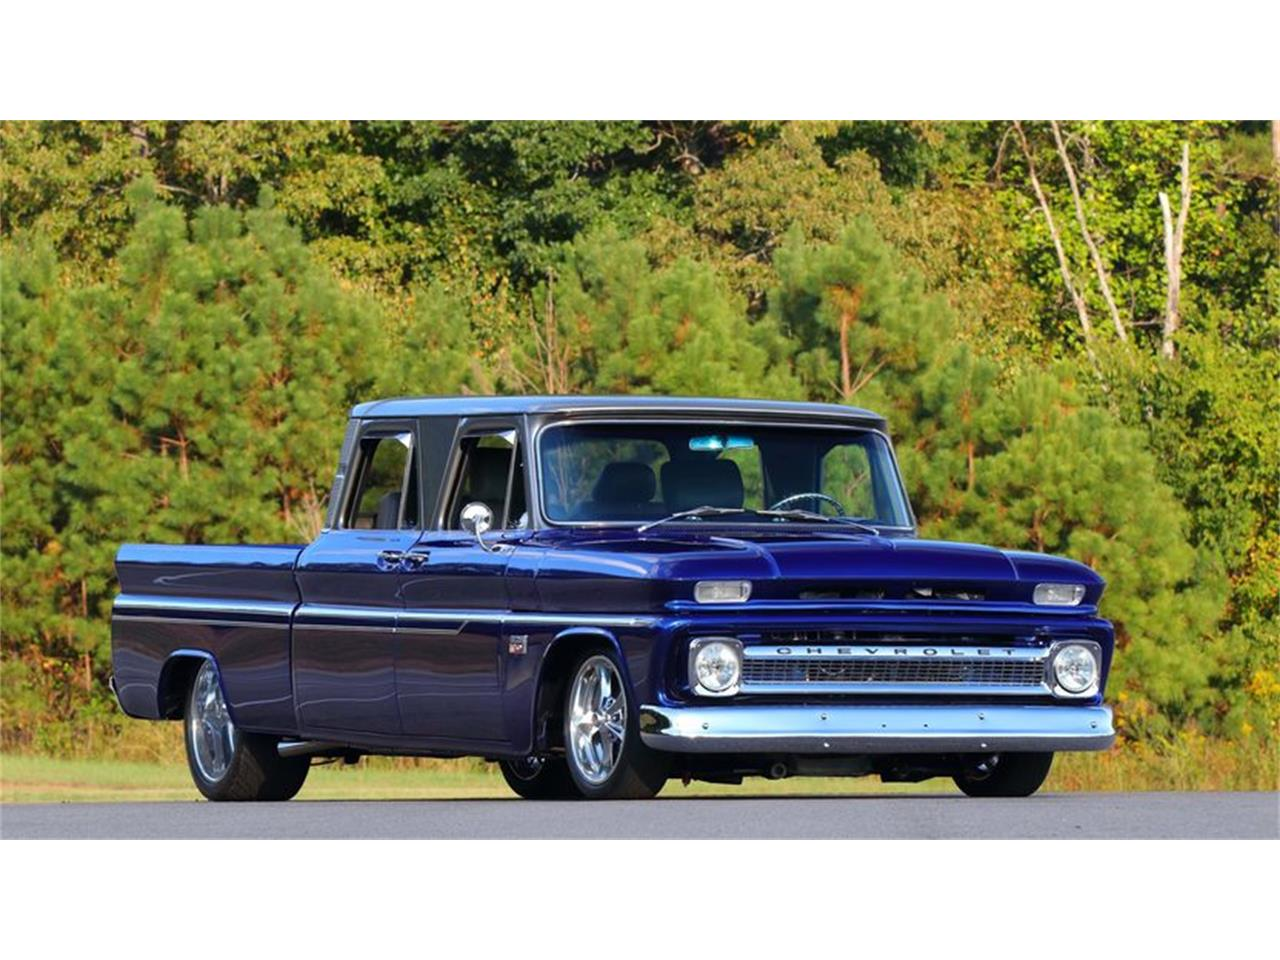 1965 Chevrolet Crew Cab For Sale Cc 908153 1966 Large Picture Of 65 Jgqh